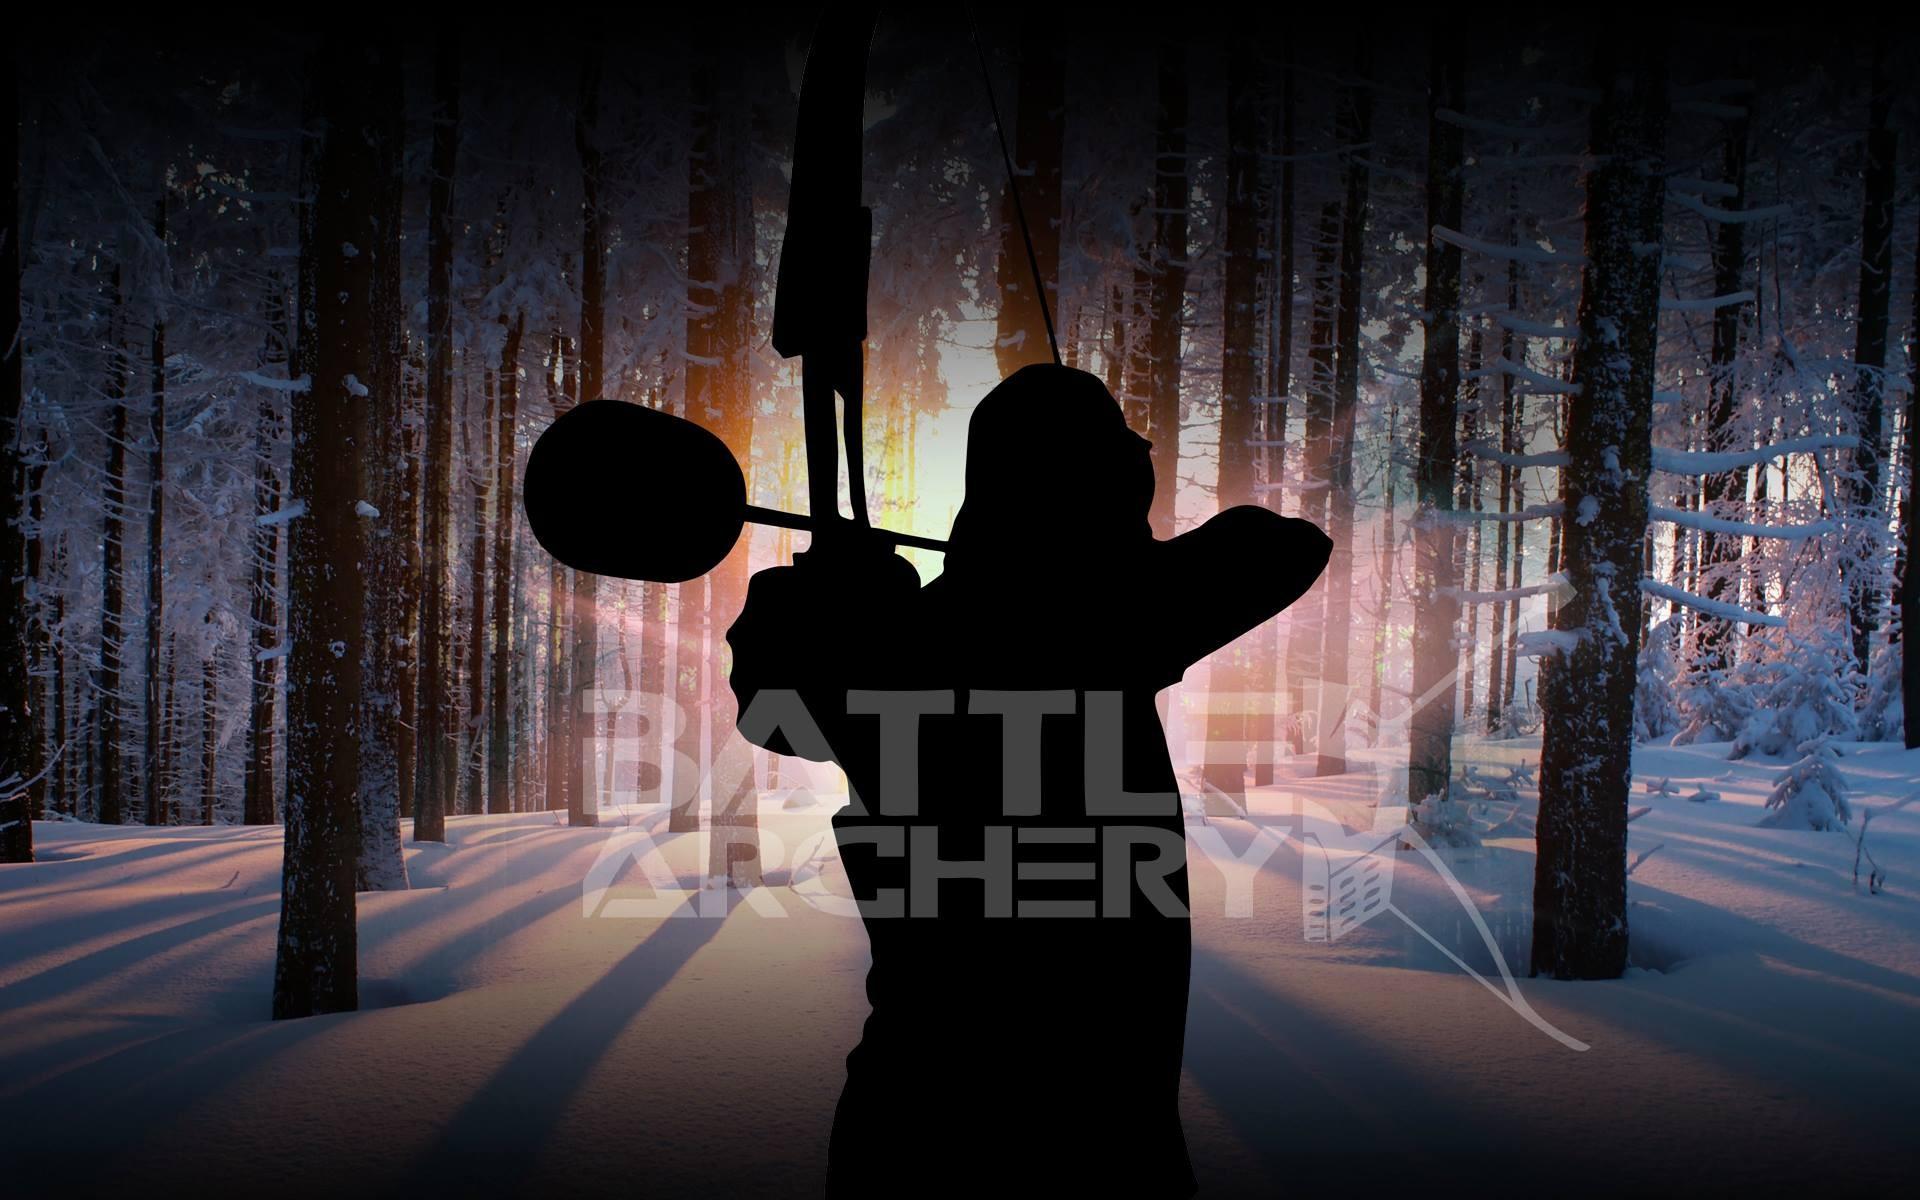 Battle Archery sur la neige